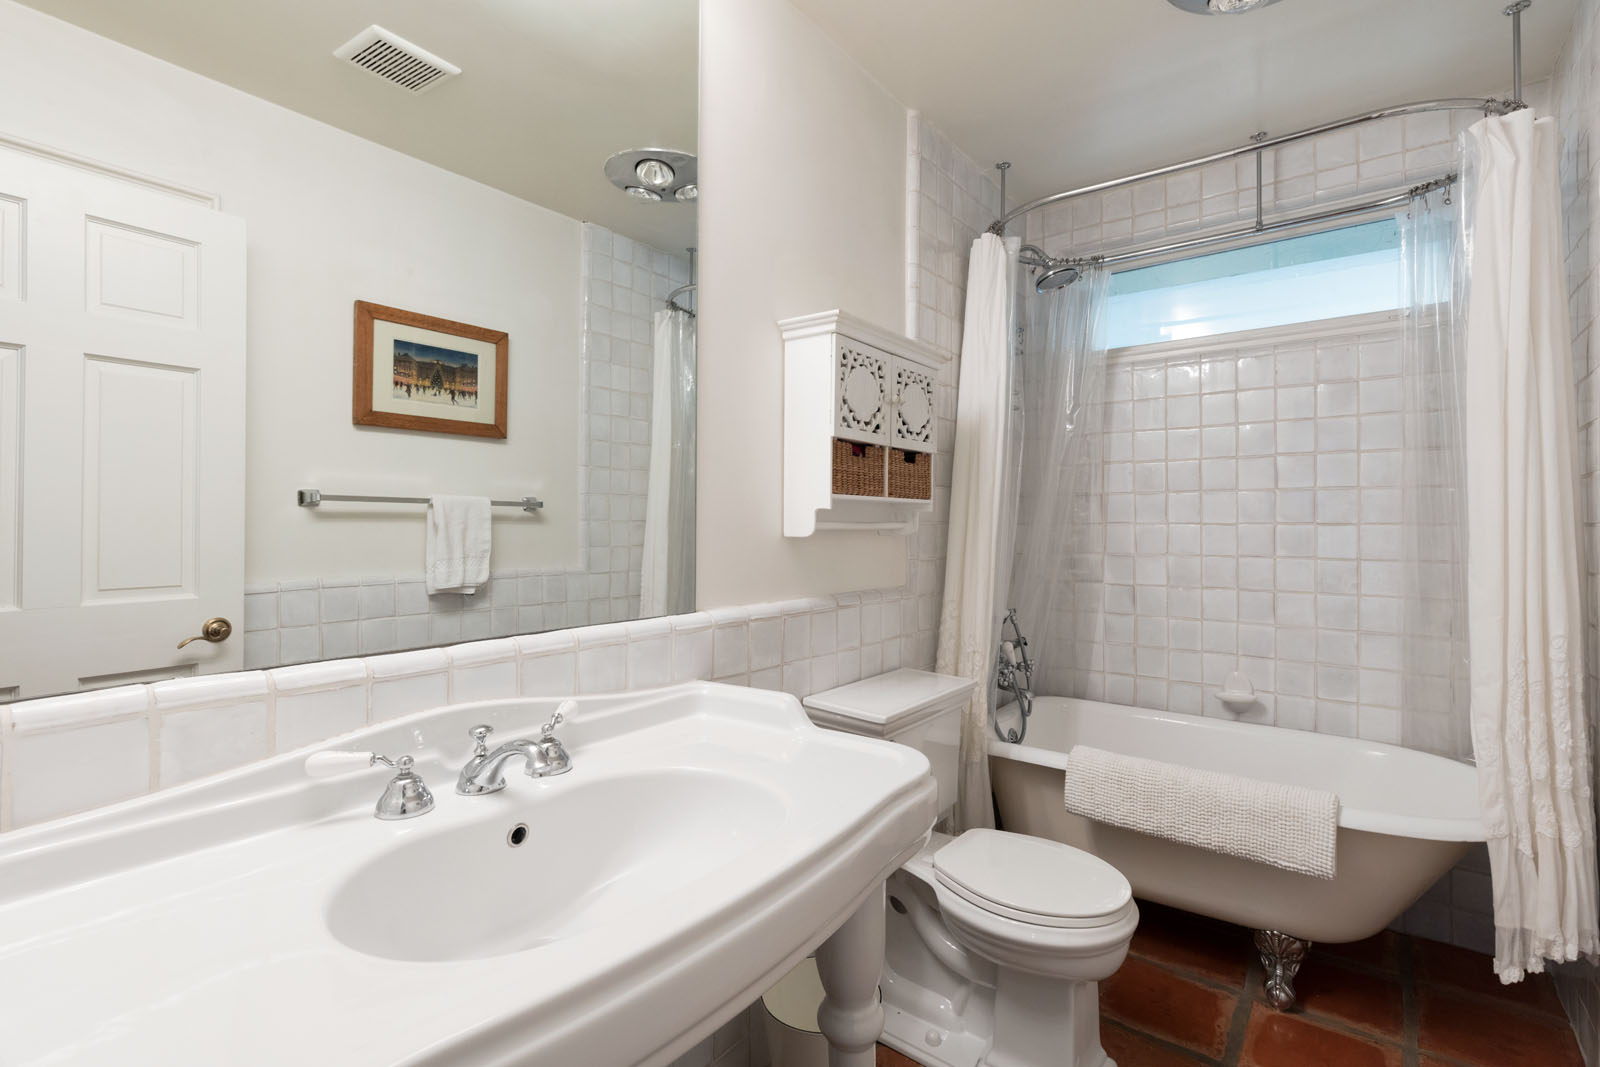 025 Bathroom 1712 Manzanita Park Avenue Malibu For Sale Lease The Malibu Life Team Luxury Real Estate.jpg